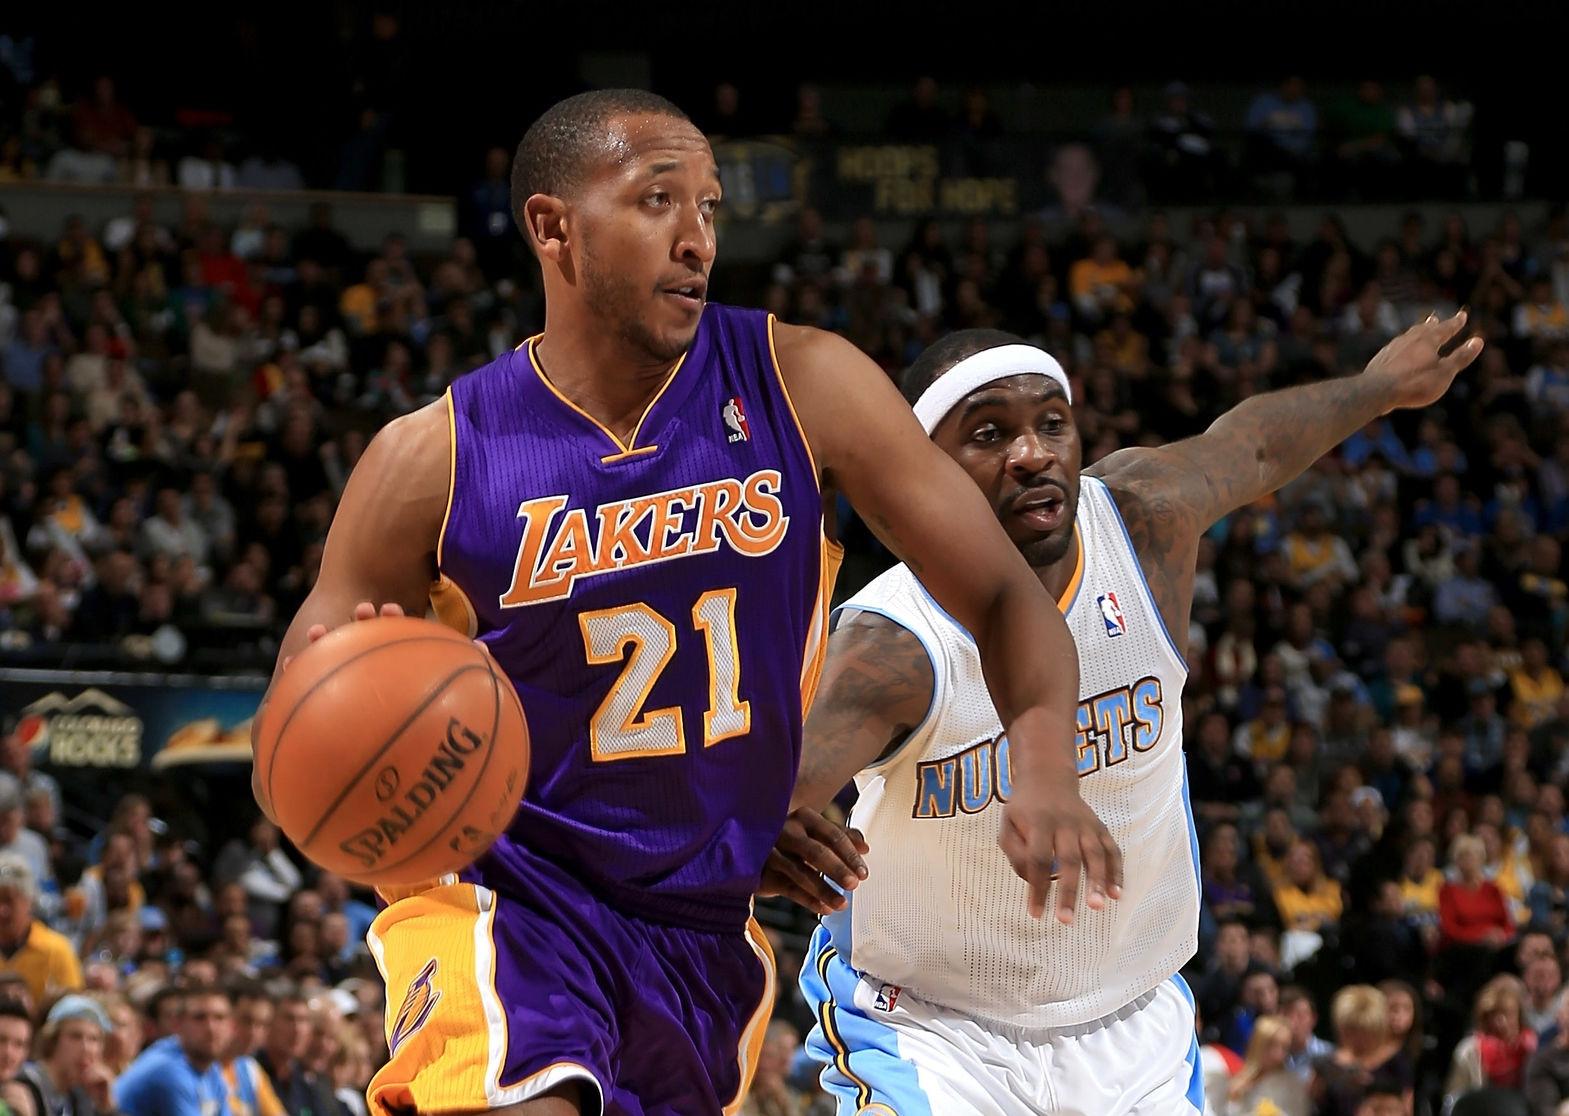 Chris Duhon, Los Angeles Lakers